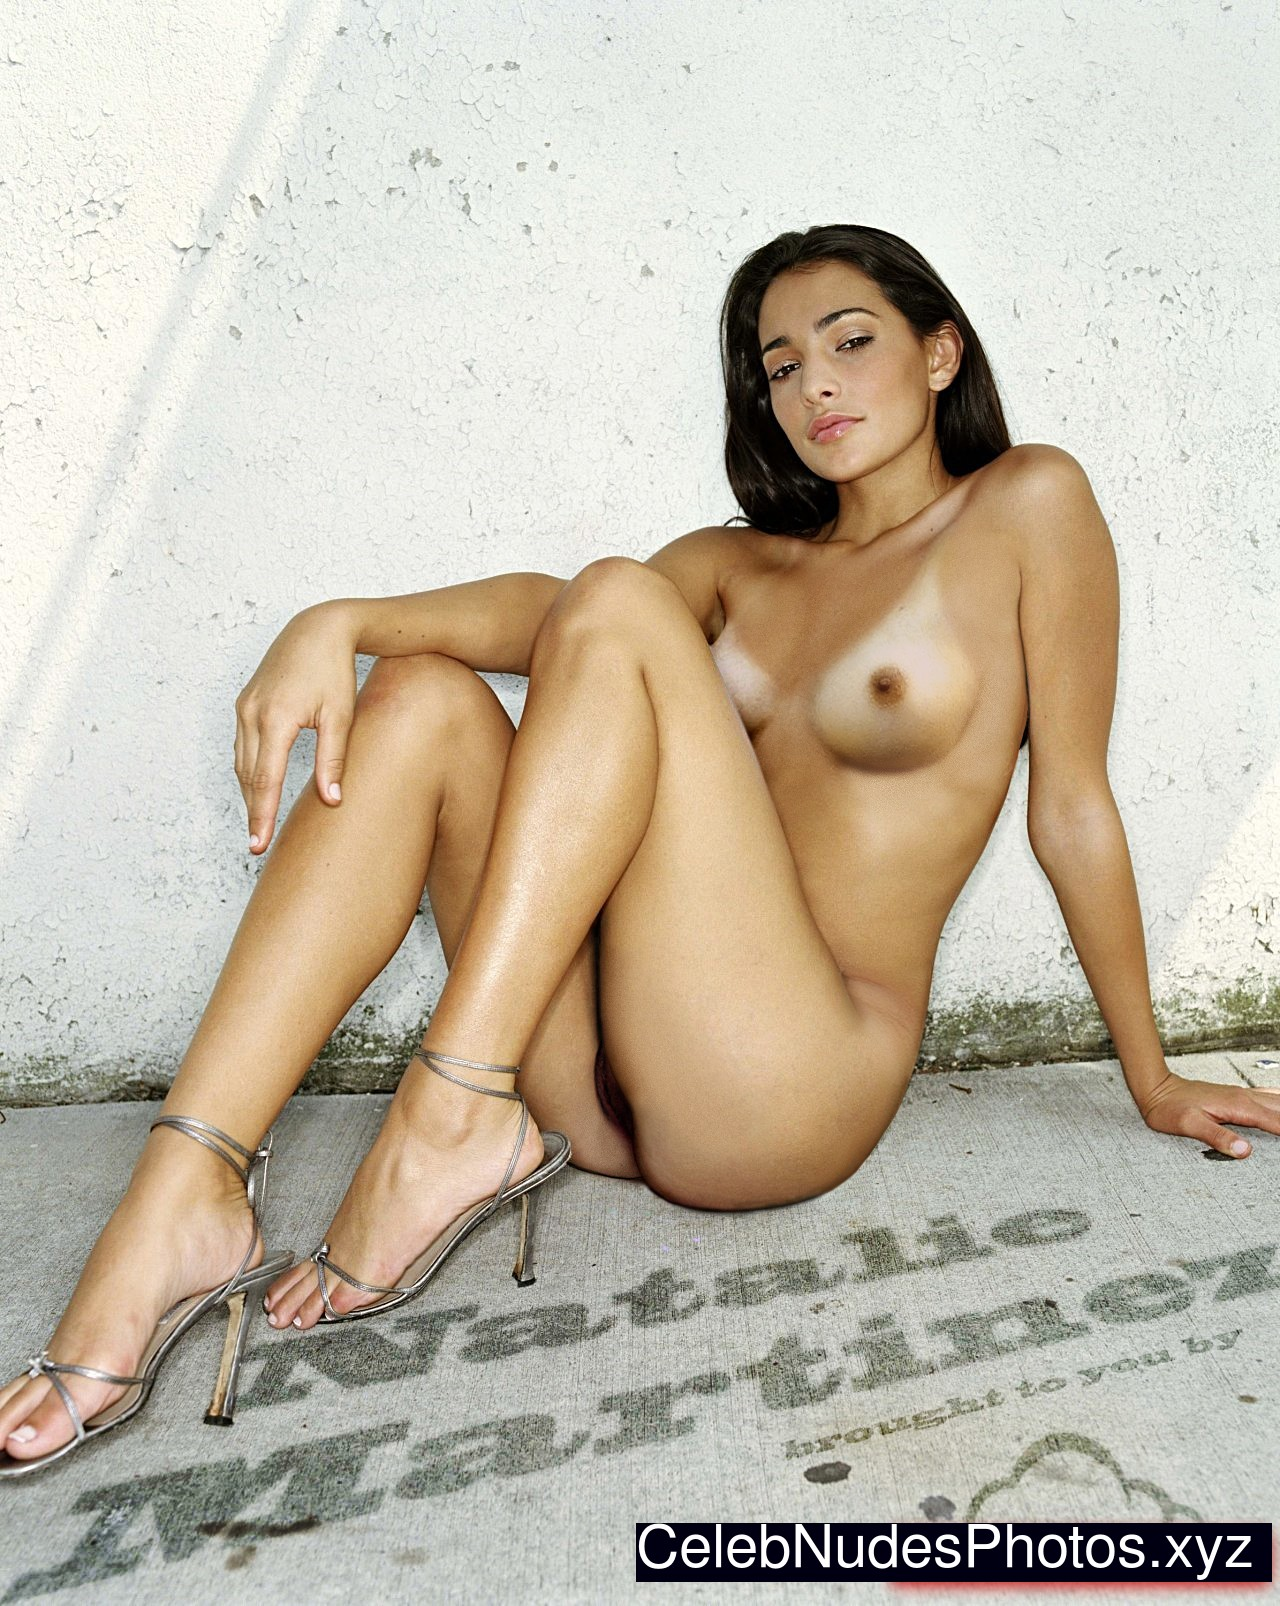 Met art marina c naked